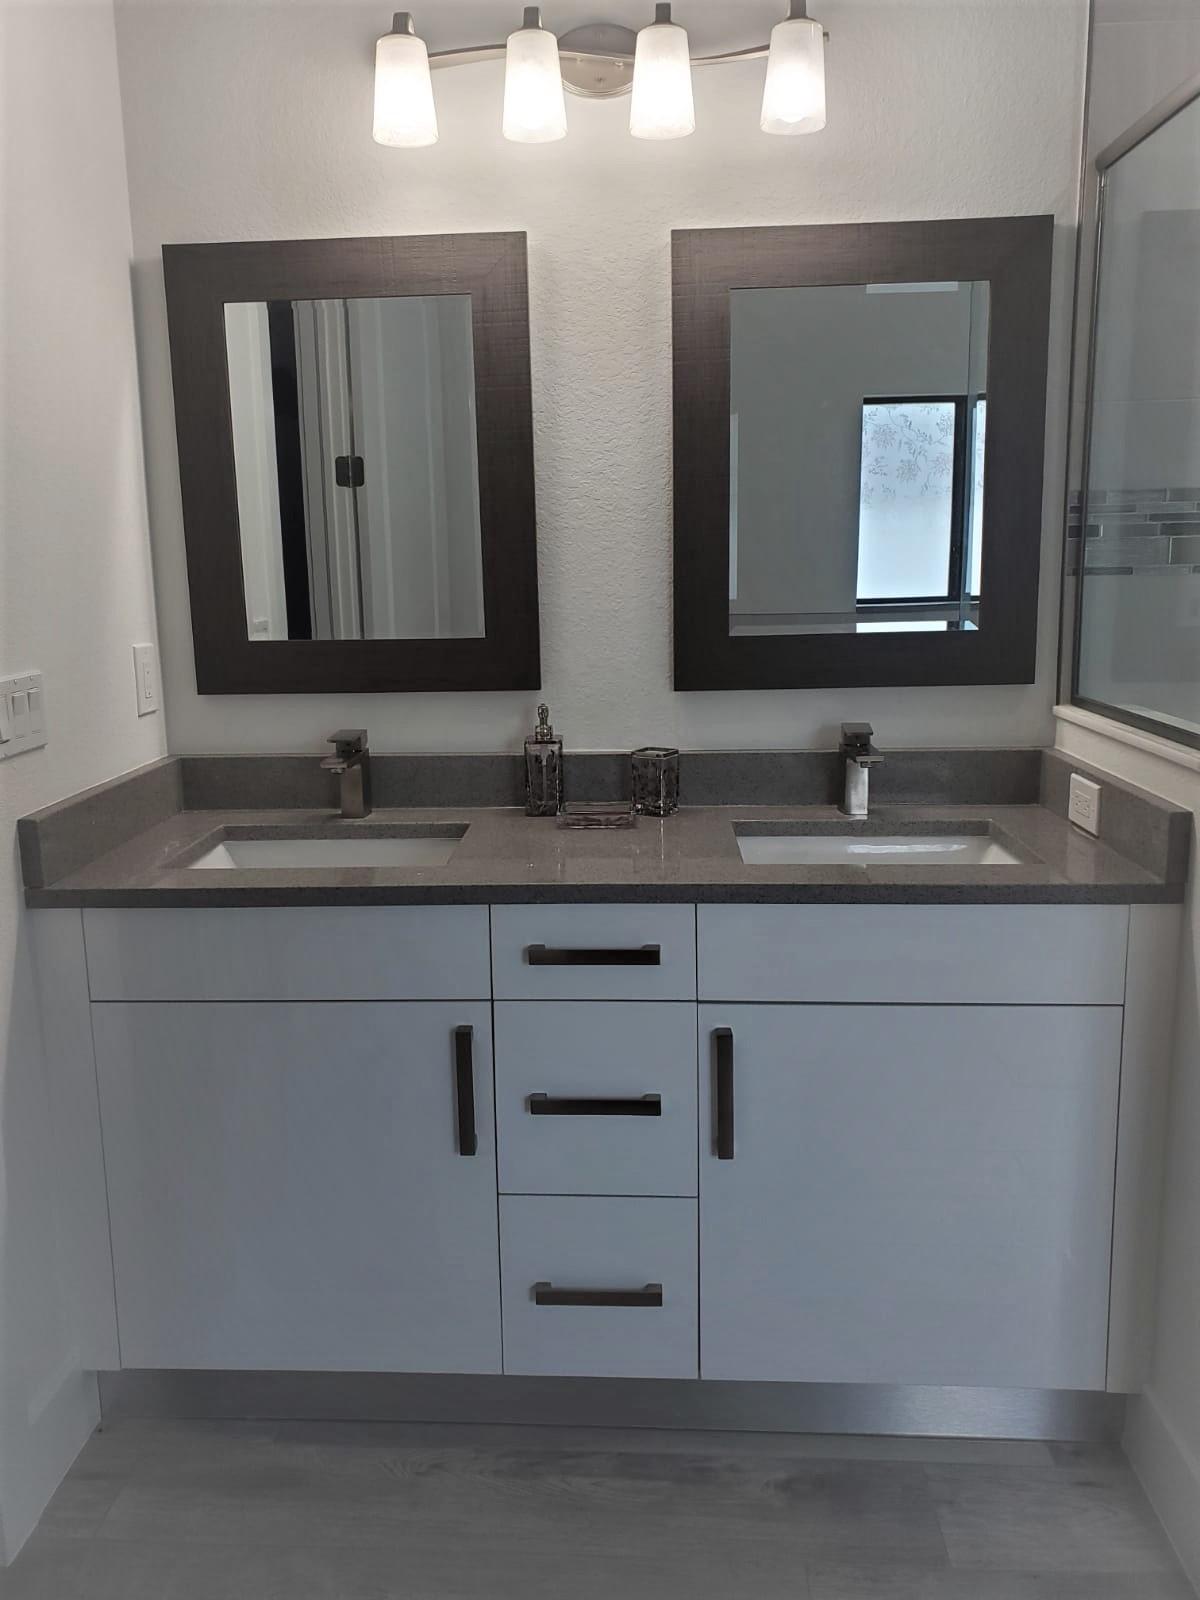 master bathroom gw with light gray